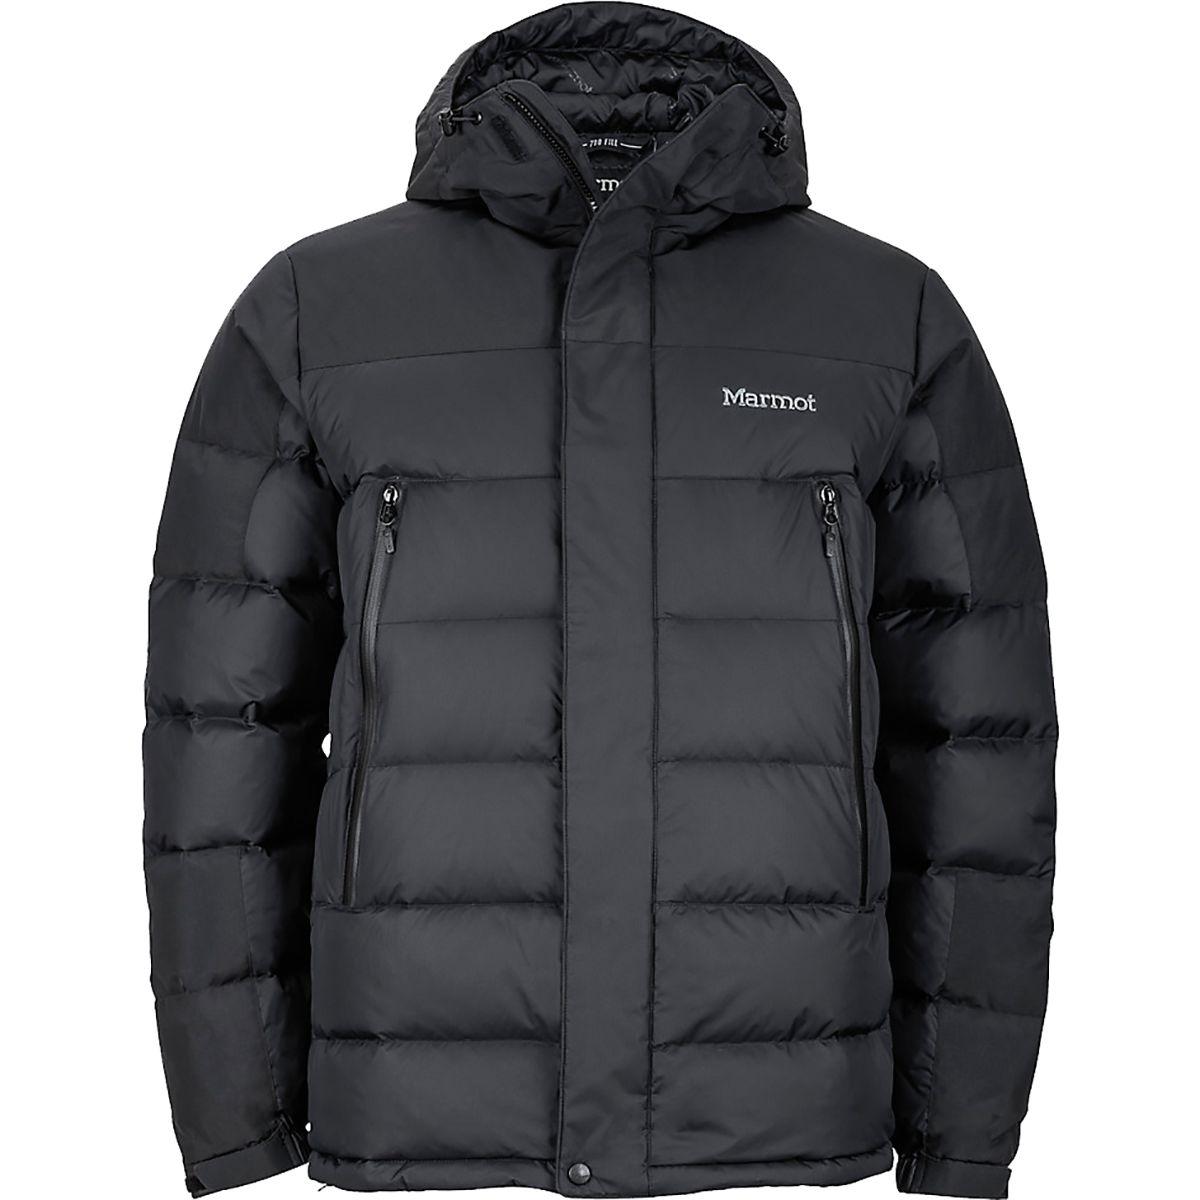 ceea773c6 Marmot Mountain Down Jacket Reviews - Trailspace